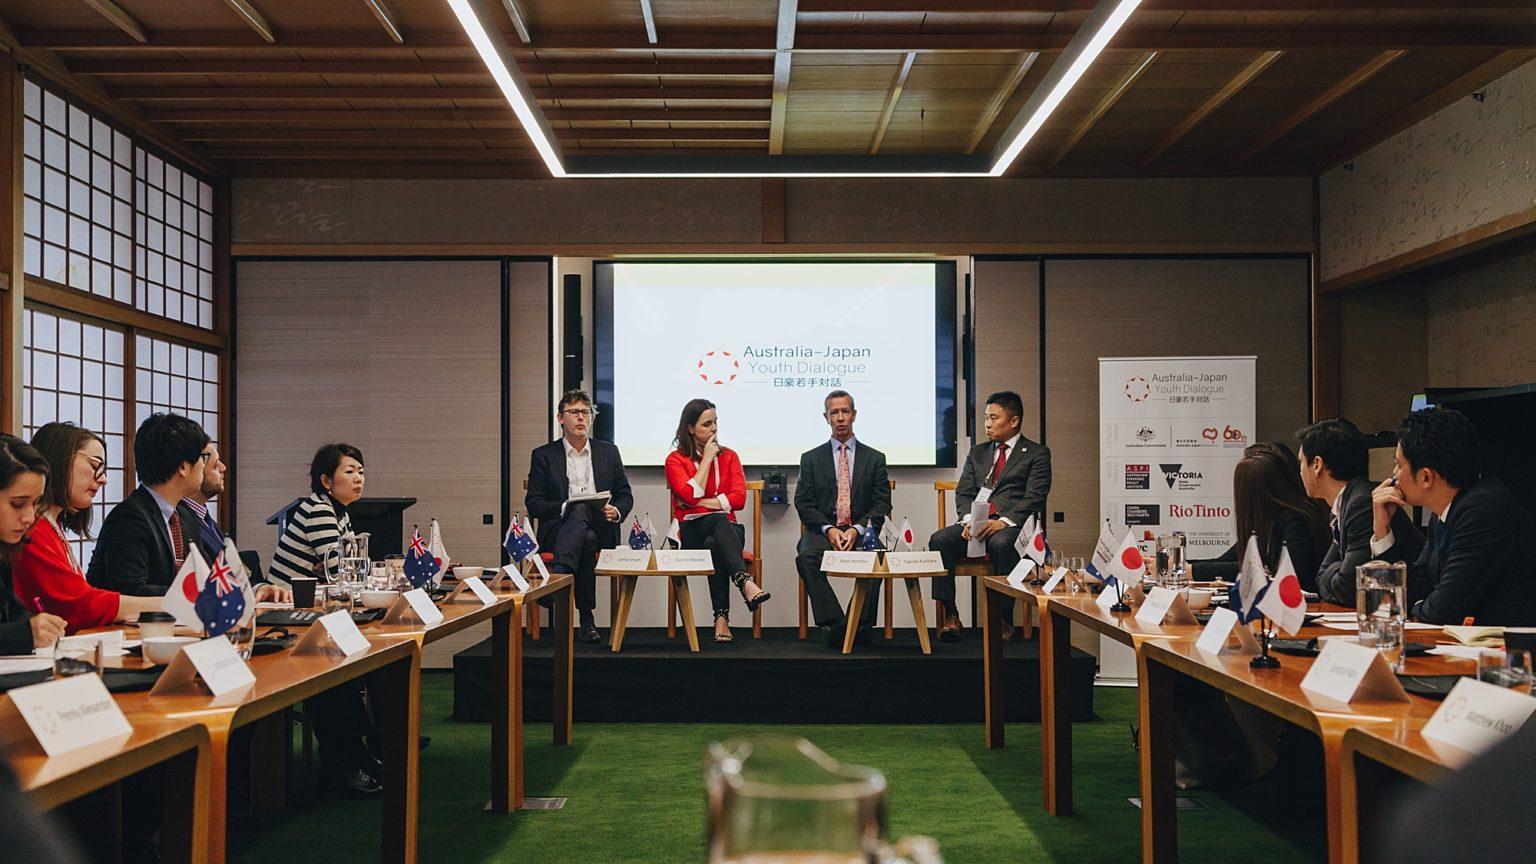 Australia-Japan Youth Dialogue